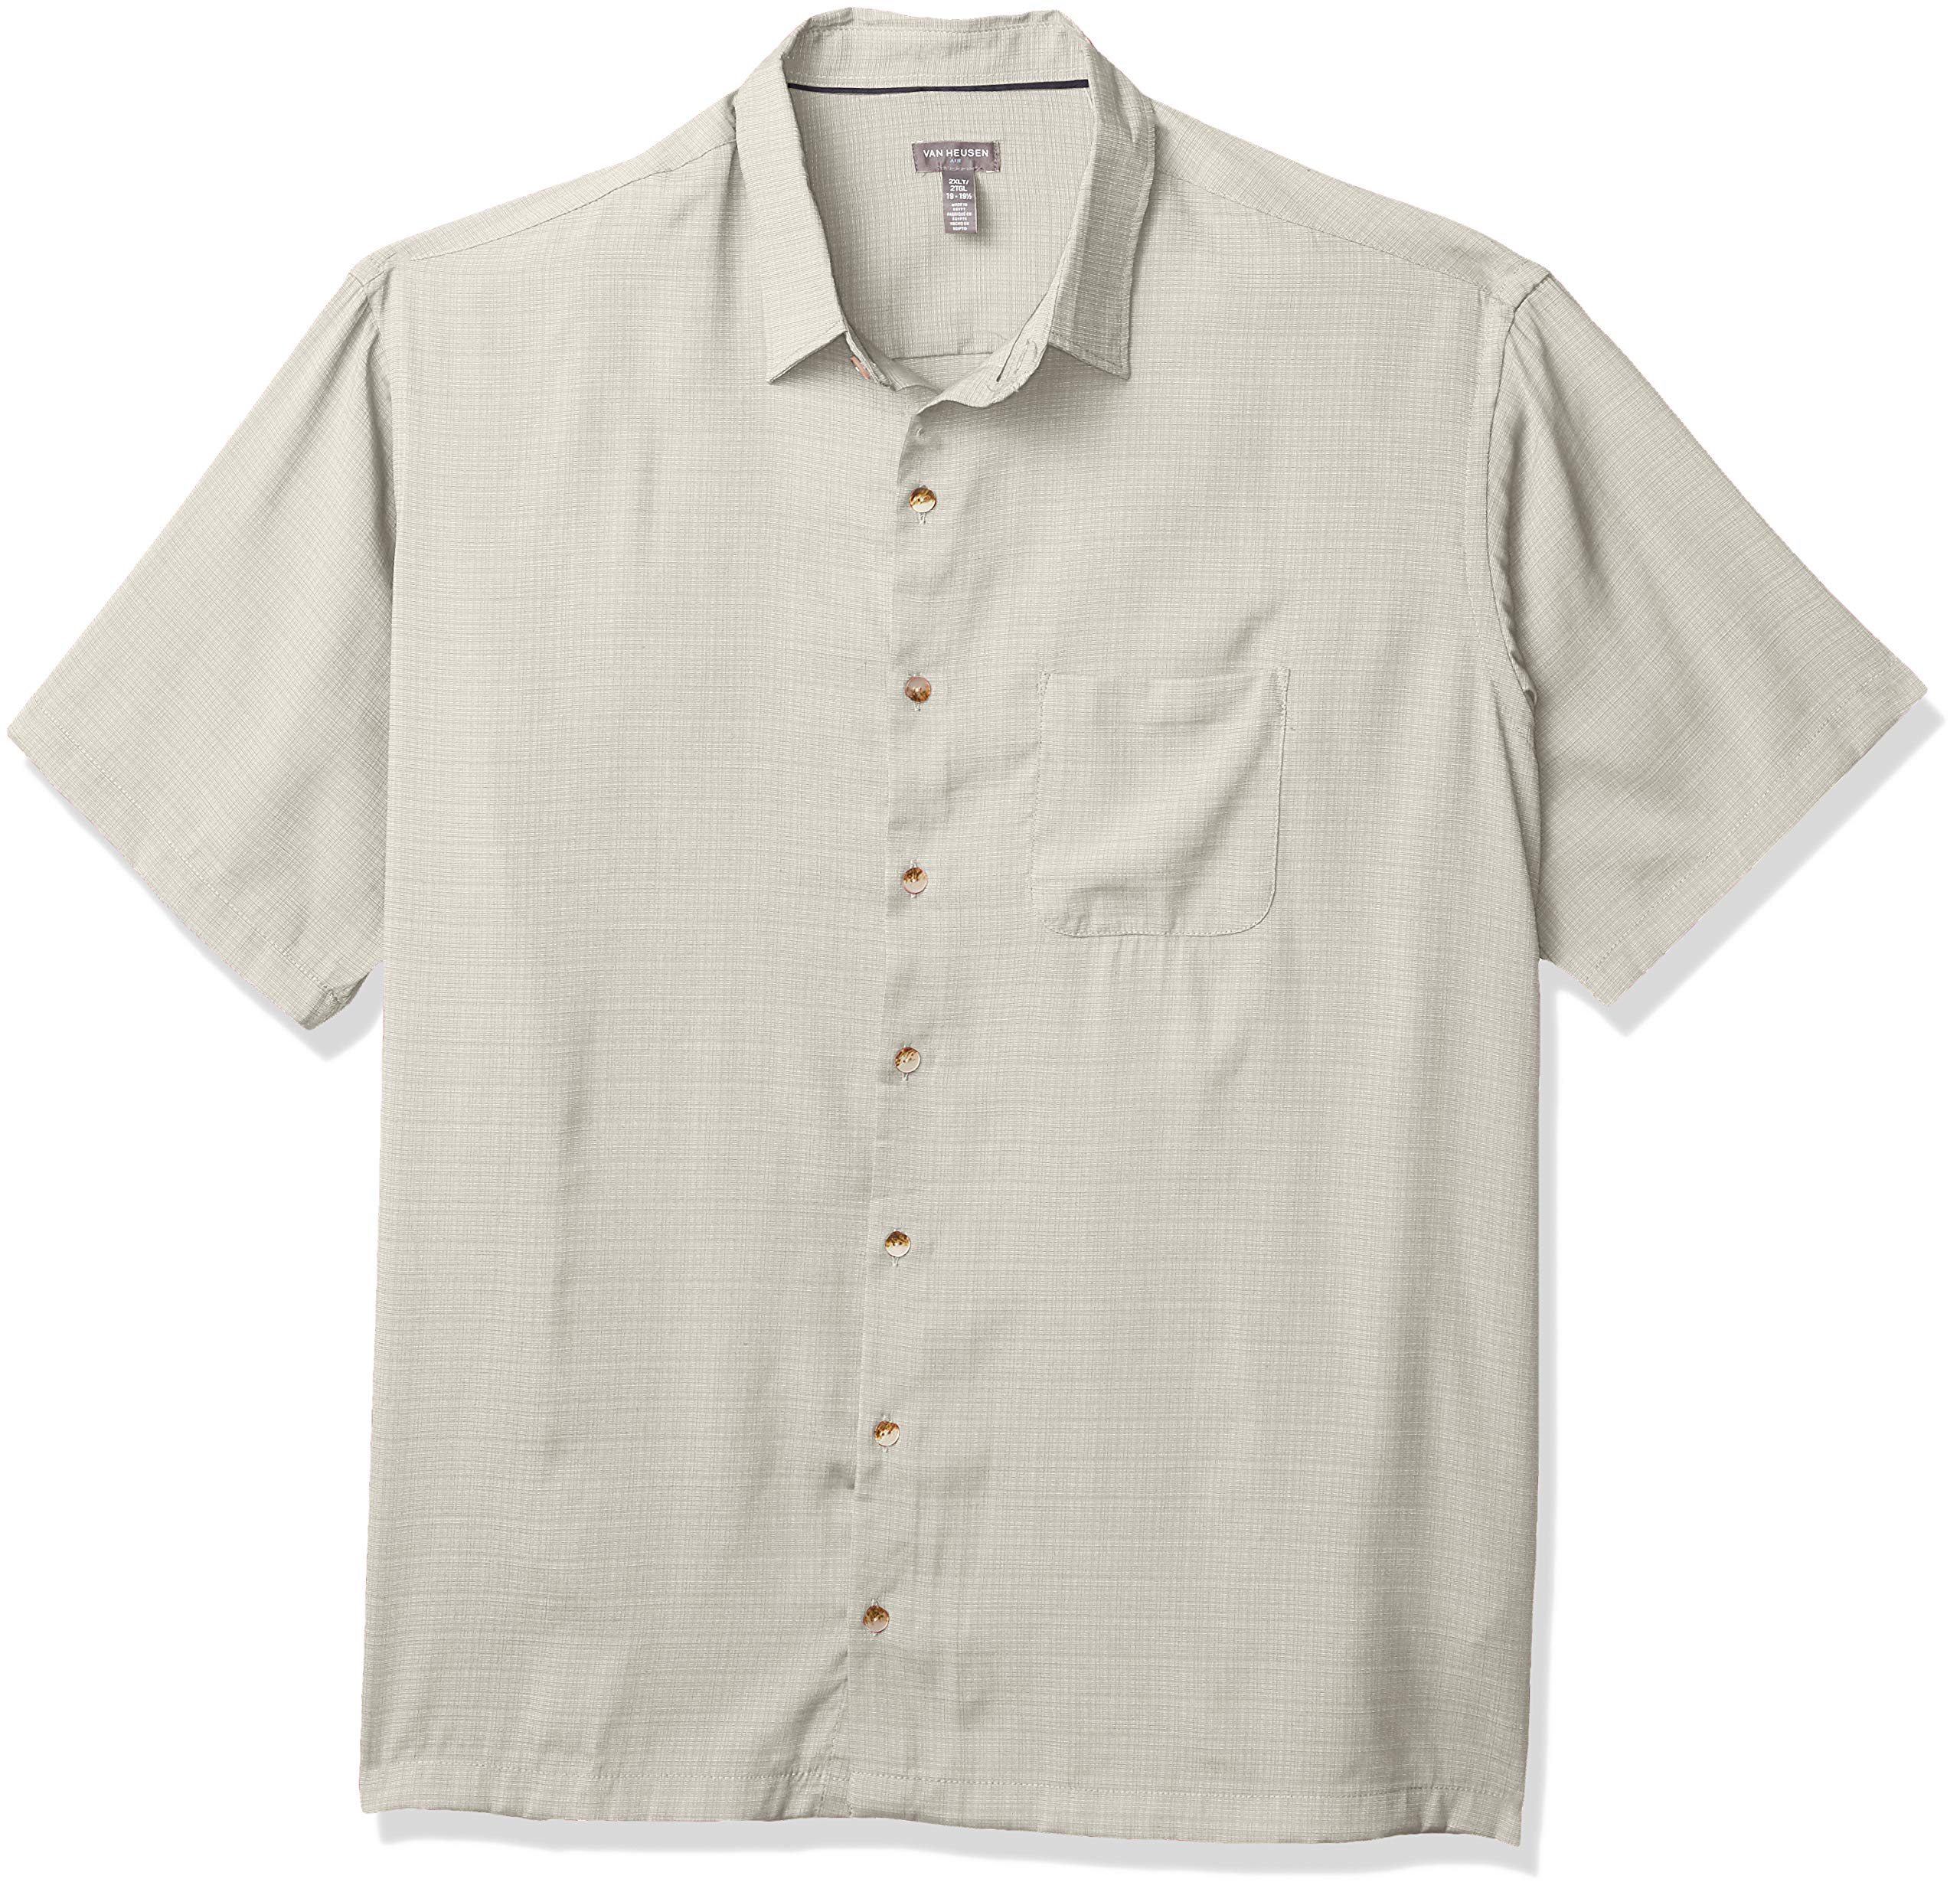 Van Heusen Men's Big and Tall Air Short Sleeve Button Down Grid Shirt